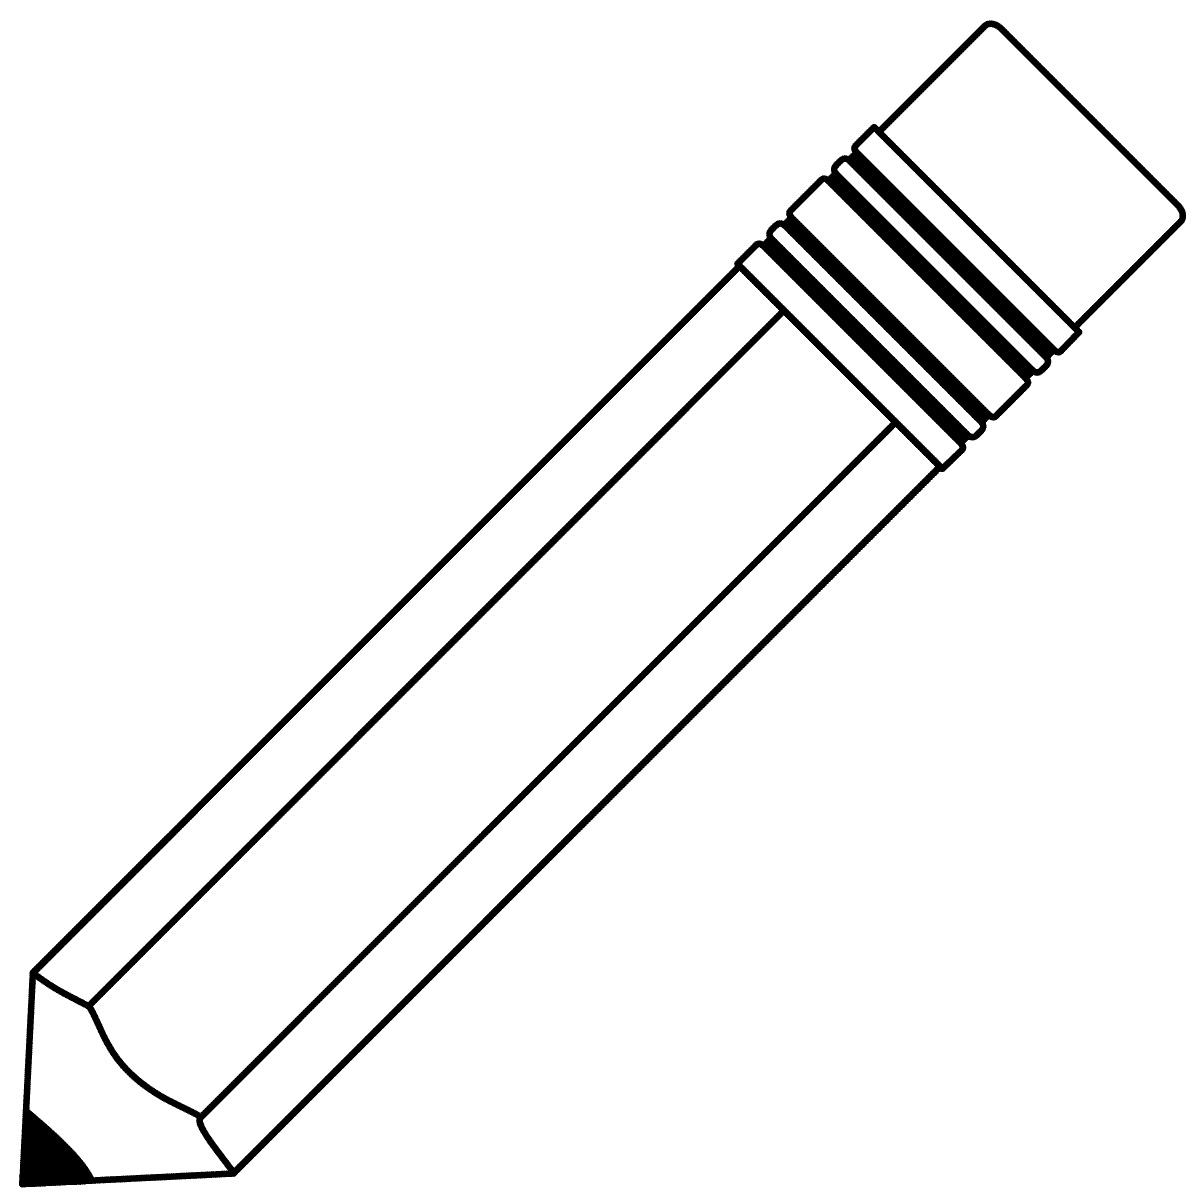 Line Drawing Pencil : Pencil line art cliparts